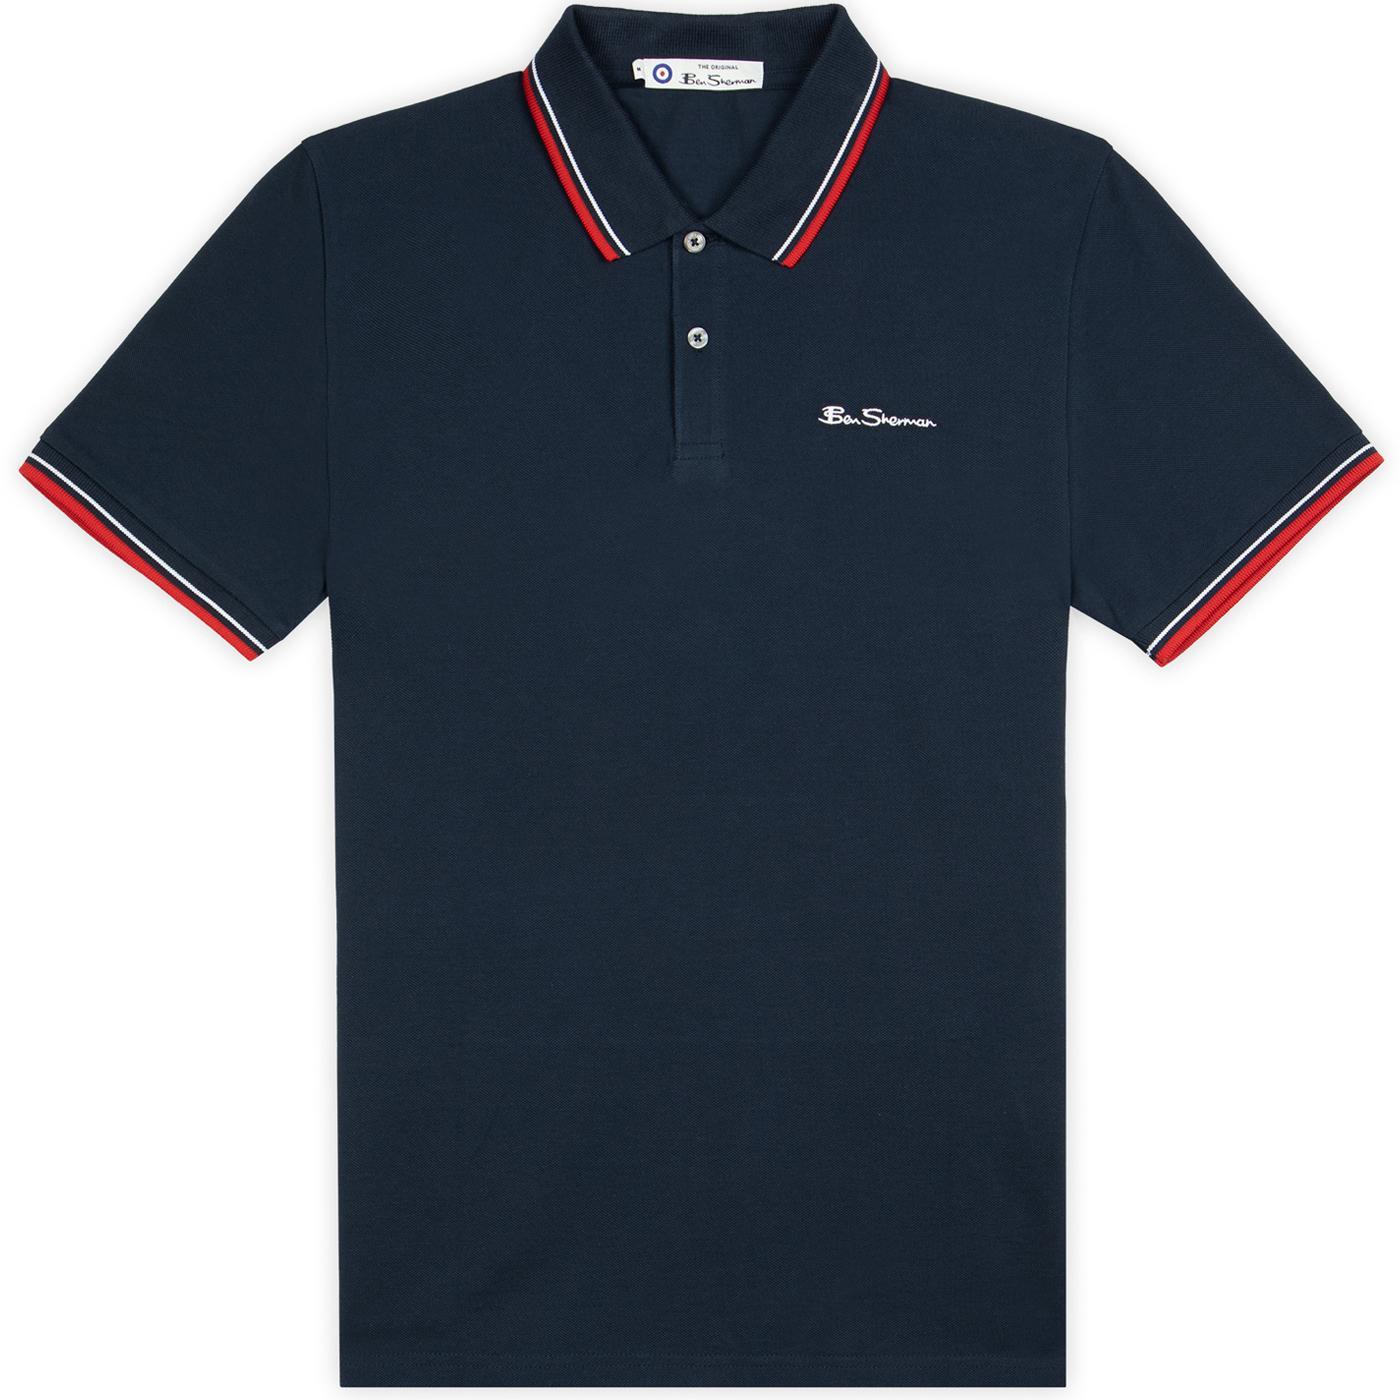 BEN SHERMAN Mod Tipped Signature Polo Top (Navy)